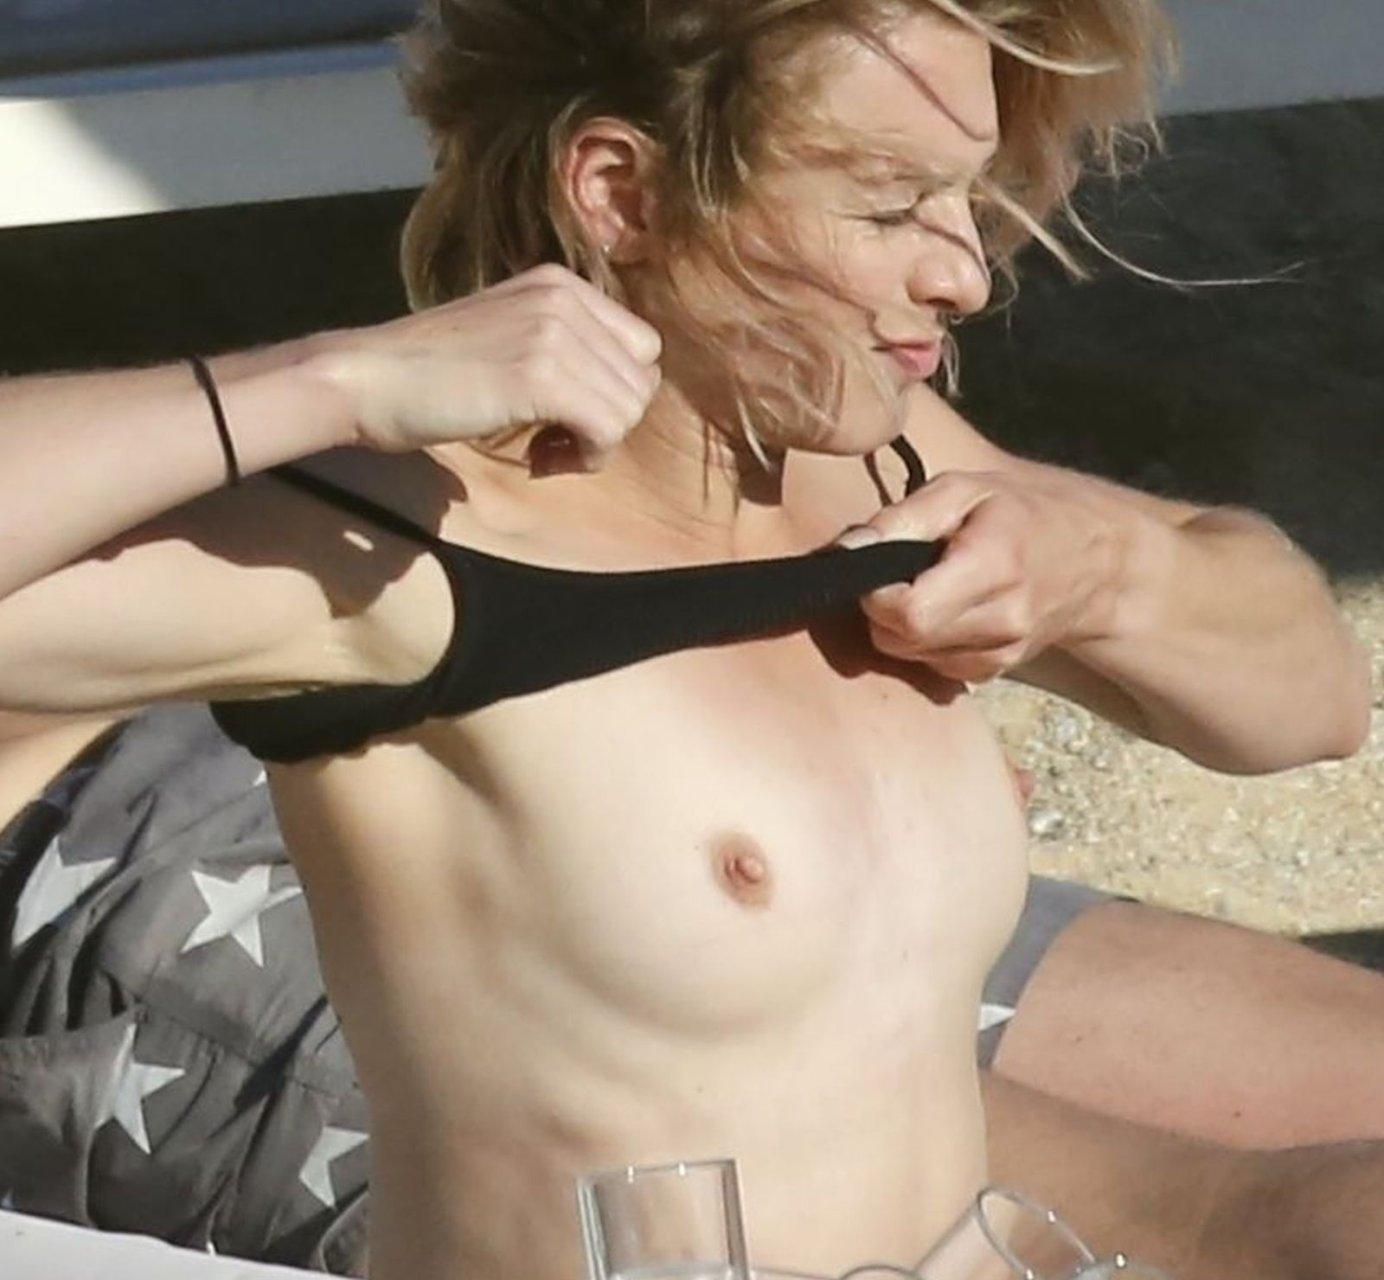 Stephanie-Pratt-Sexy-Topless-TheFappeningBlog.com-11.jpg